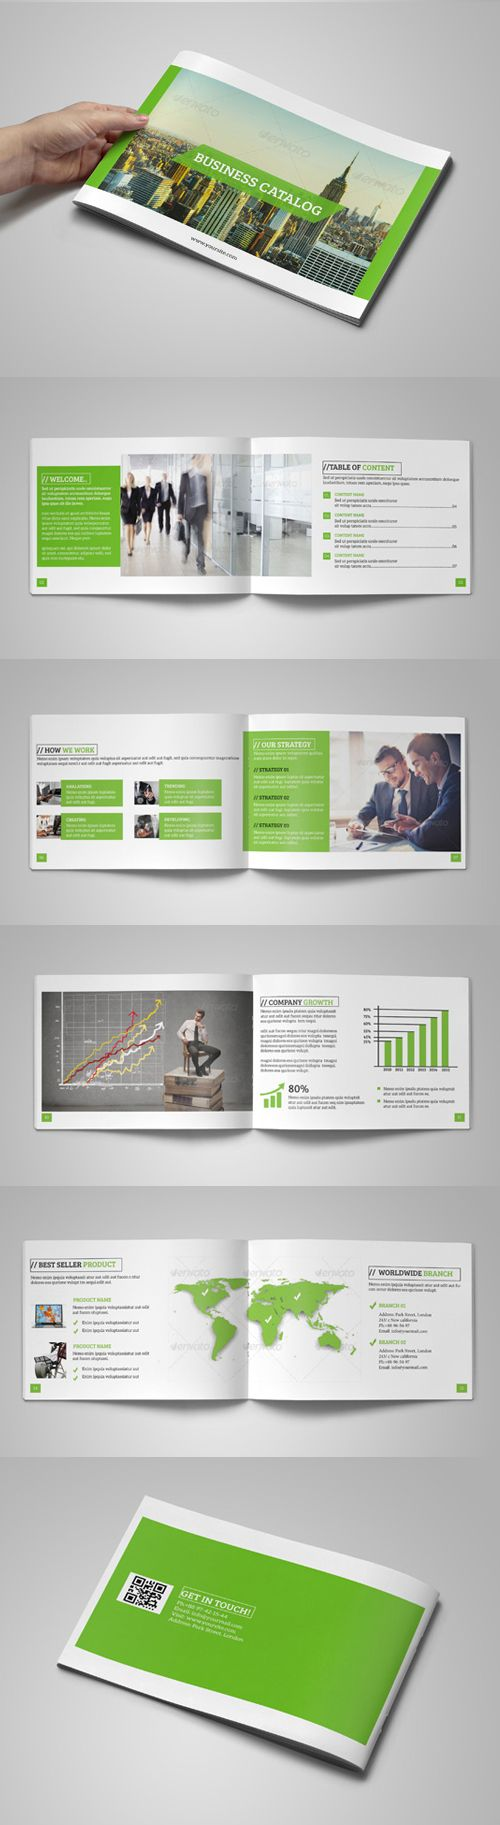 Business catalog brochure template print design pinterest business catalog brochure template accmission Gallery